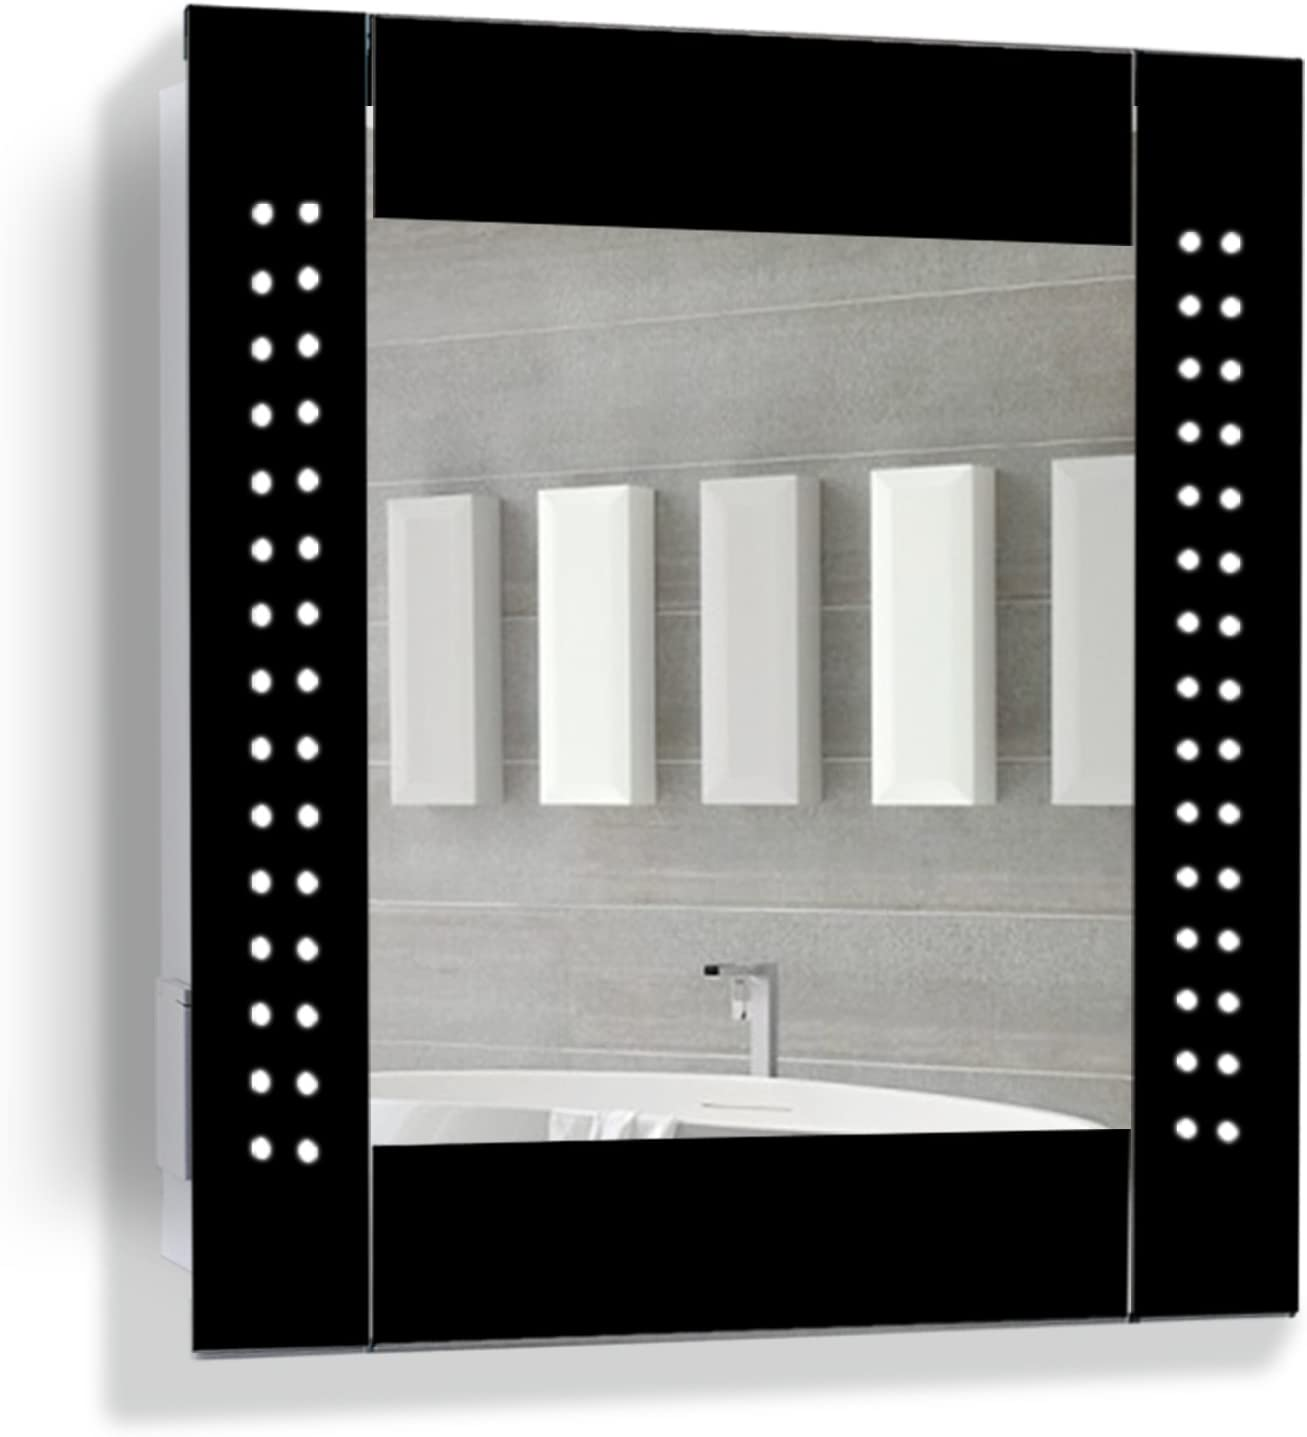 amazon co uk mirror cabinets home kitchen rh amazon co uk Bamboo Bathroom Cabinets Kohler Bathroom Mirrored Cabinets